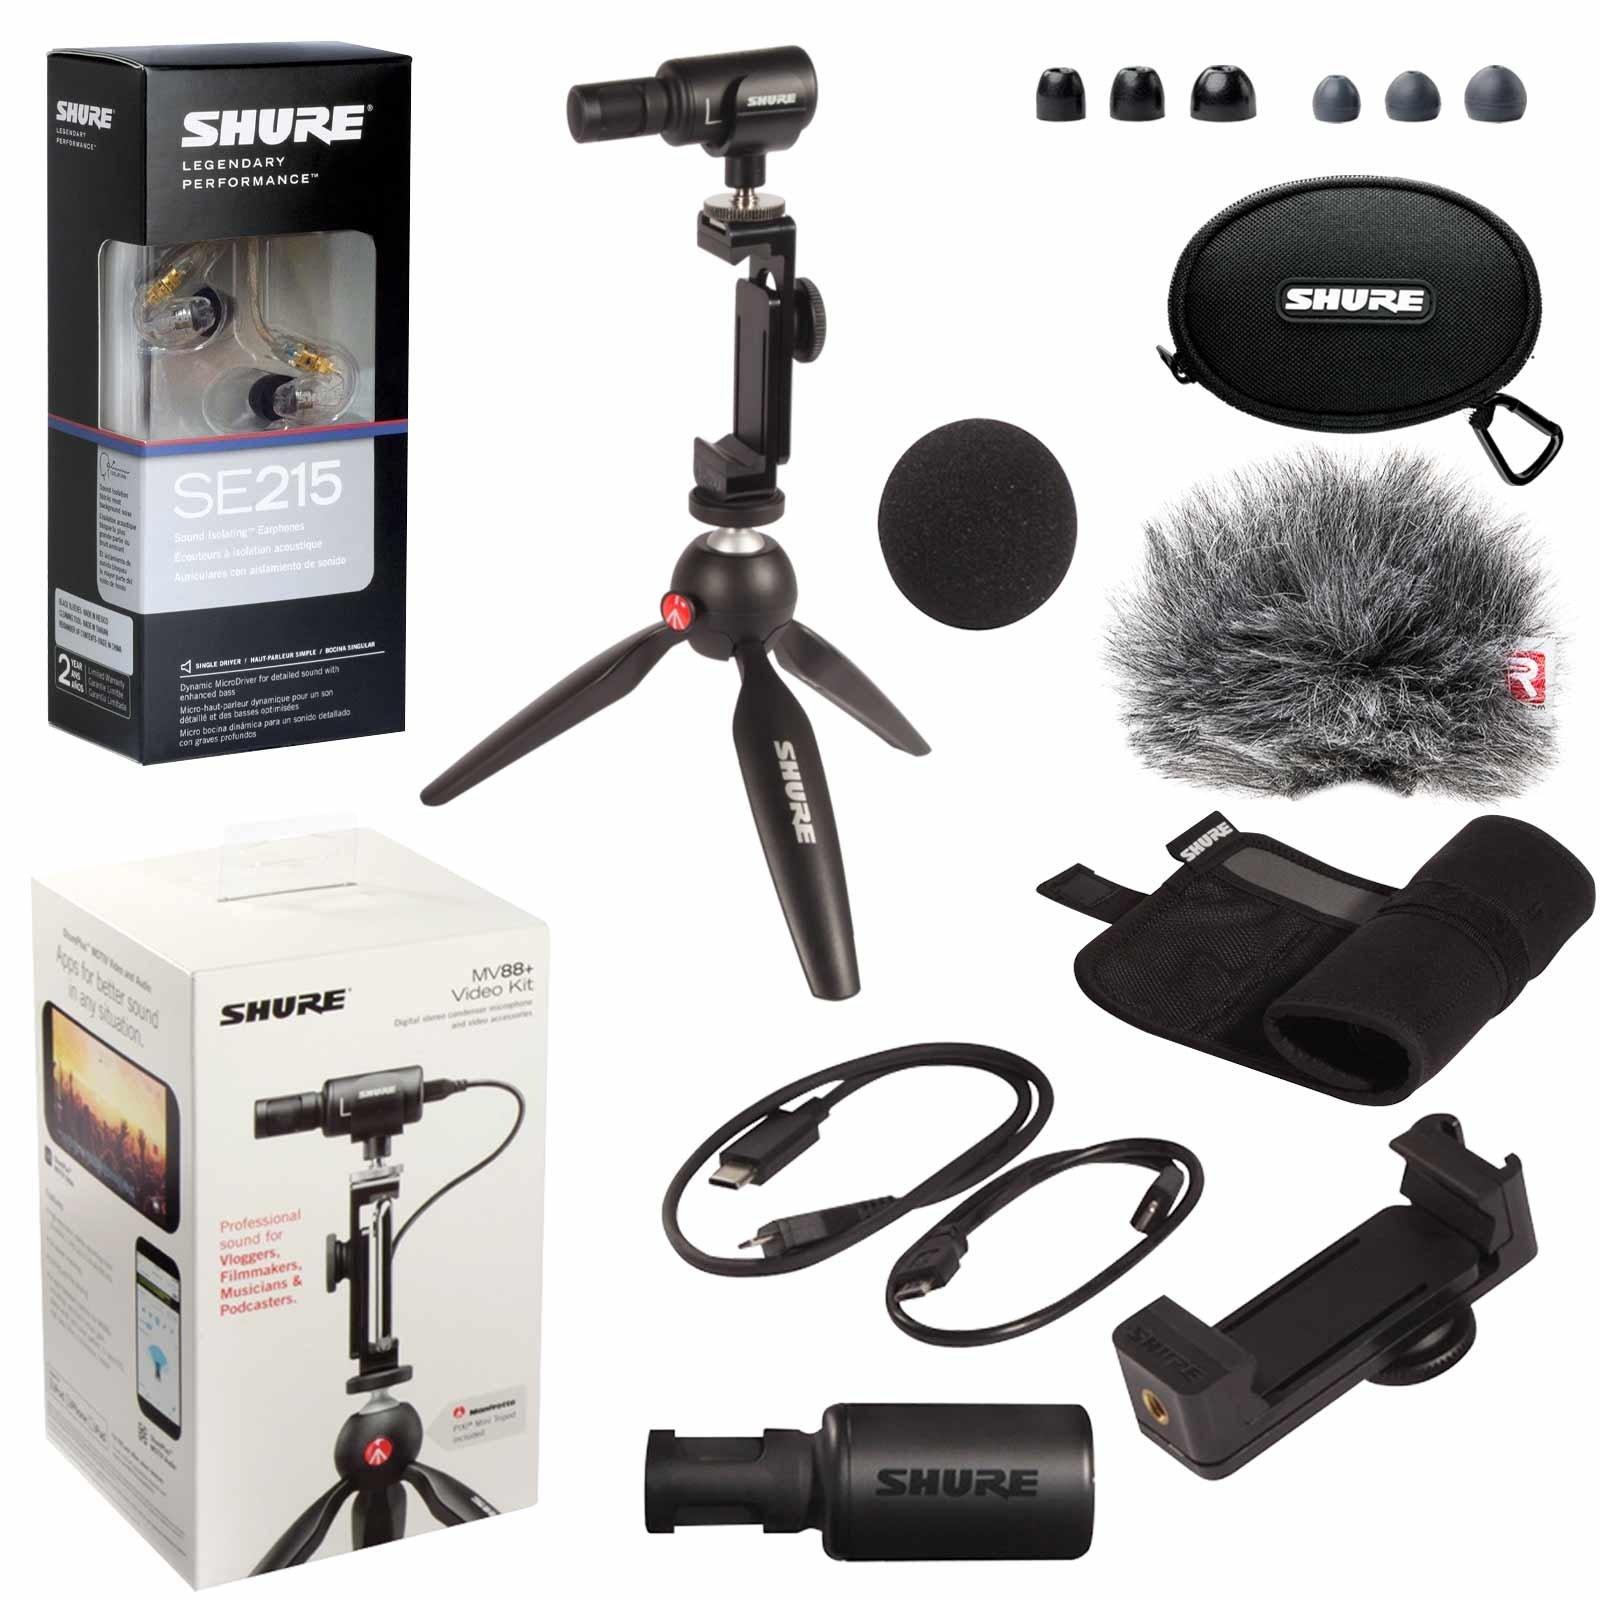 shure-mv88plusse215-portable-videography-kit.jpeg